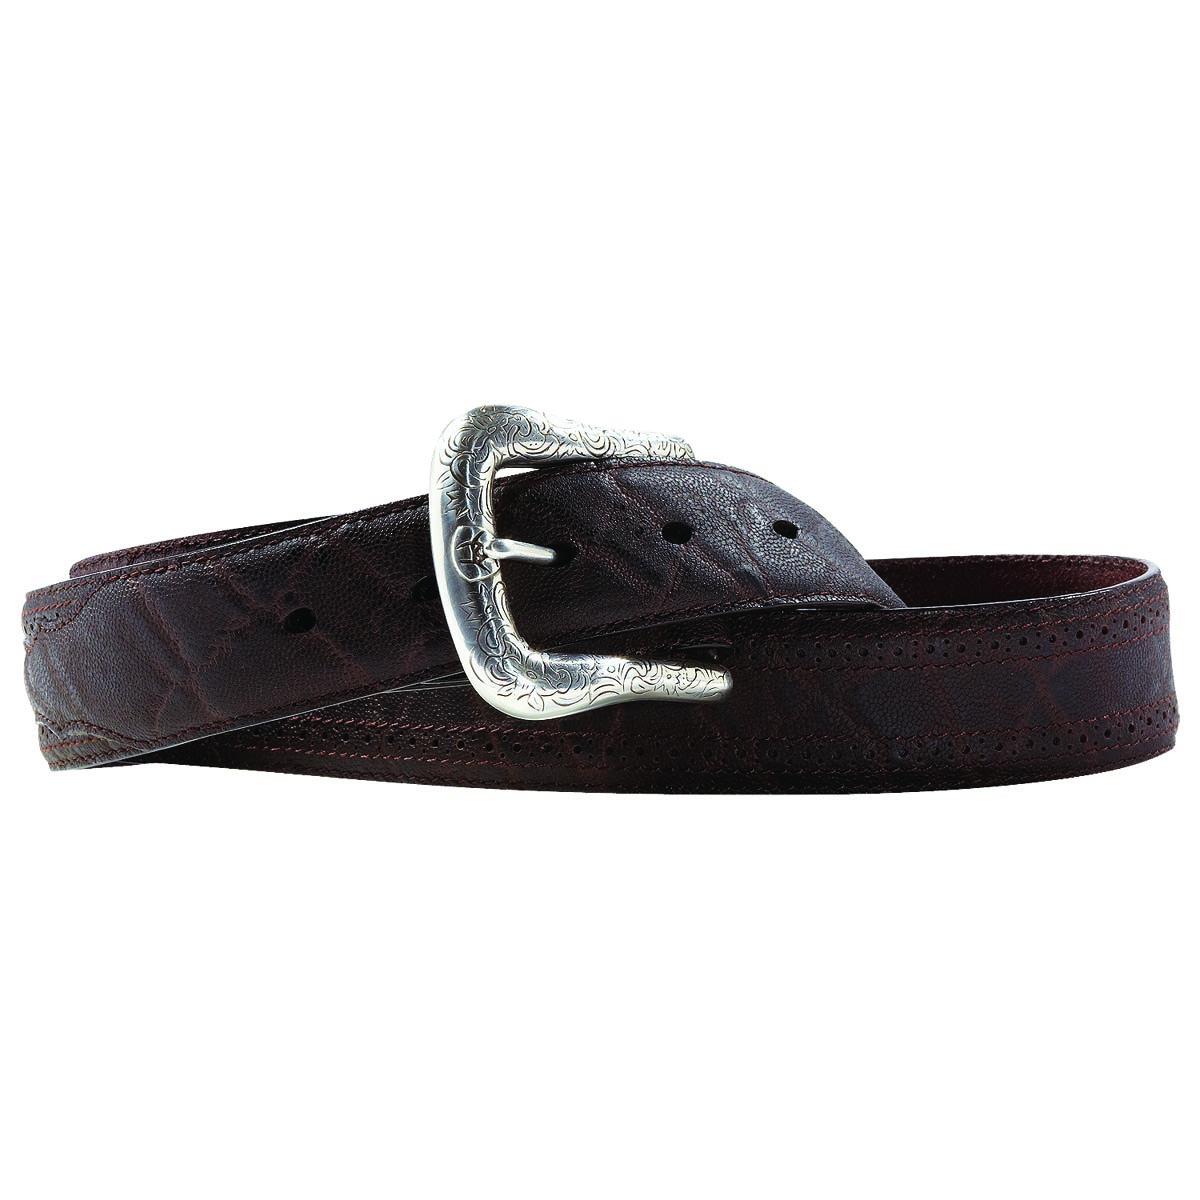 ARIAT Men's Western Basic Perforated Belt